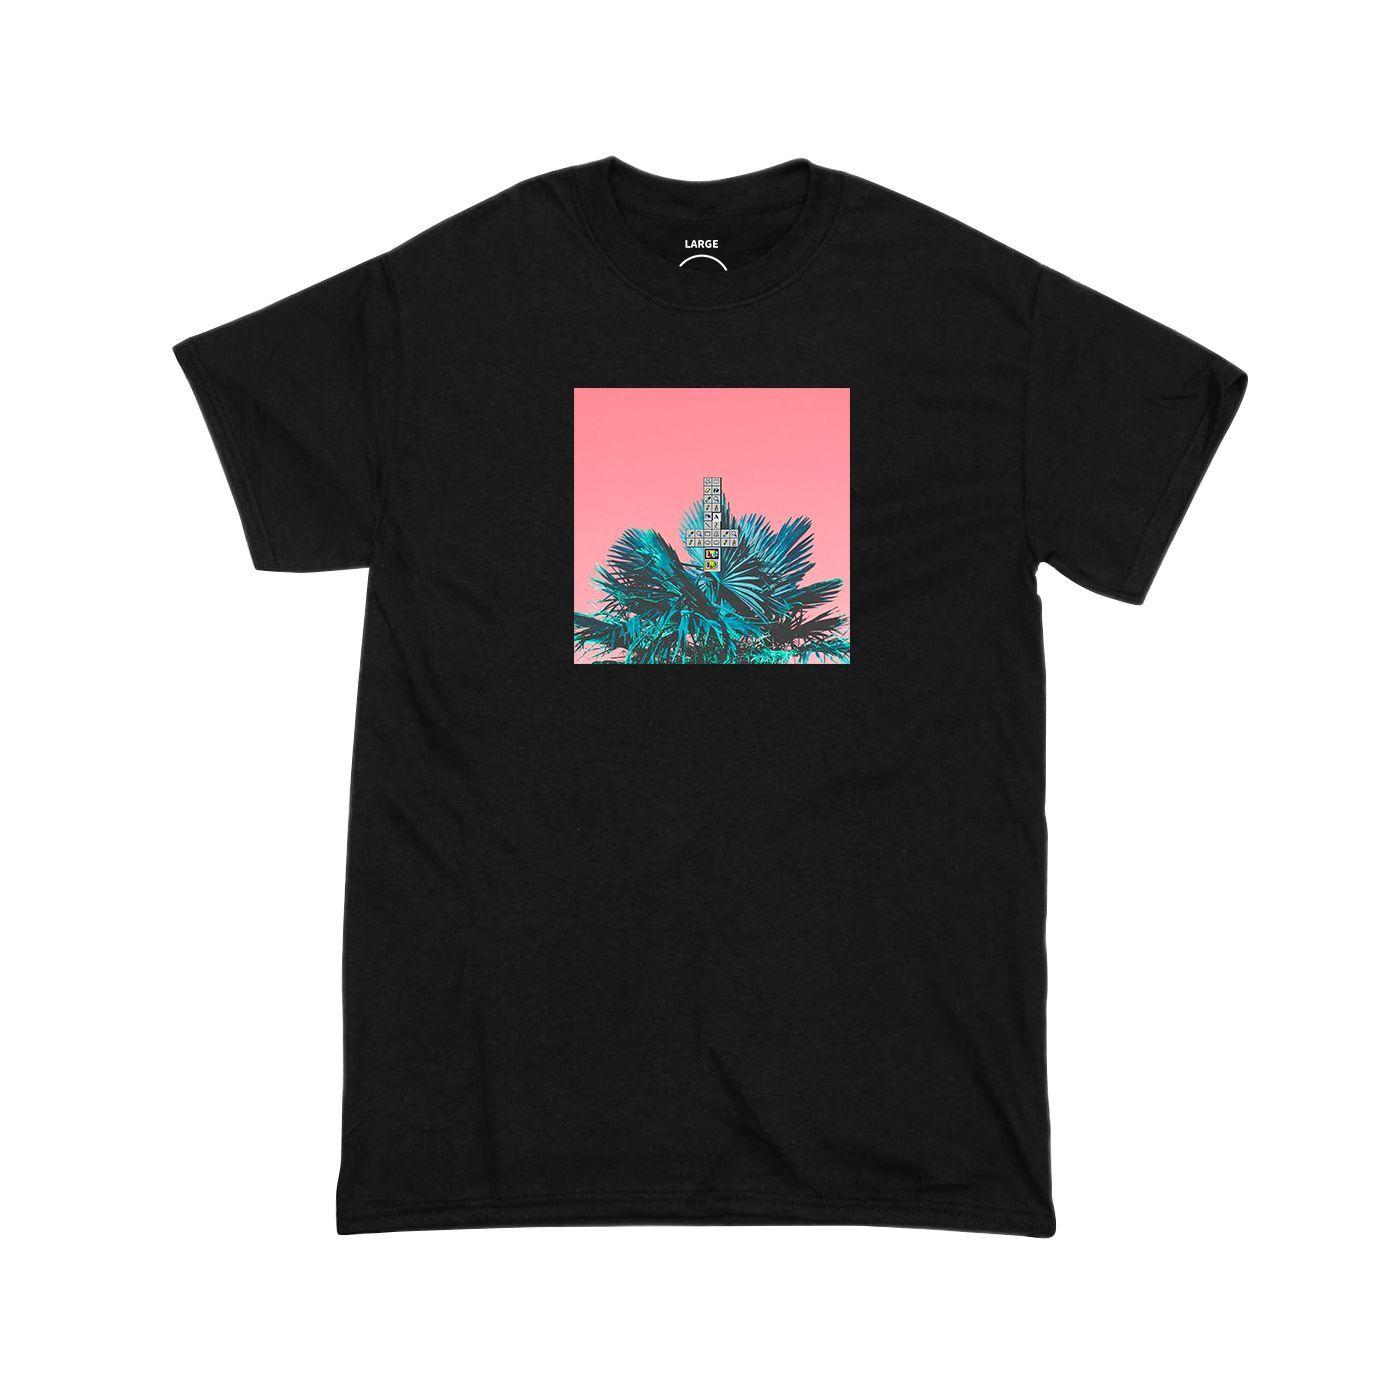 vaporwave windows #vaporwave #snap #travel #art #backpack #kawaii #cute #japan #jfashion #streetfashion #pale #fairy #chic #grunge #exbition #bag #hologram #japanese #unif #punk #onlineshop #pastel #harajuku #harajukufashion #rainbow #purple #holographic #holopunk #hat #baseball #vaporwave #cyberpunk #streetgoth #tee #shirt #SADBOY #WINDOW98 #aesthetics #hologram #holographic #streetwear #MICROSOFT #WINDOW